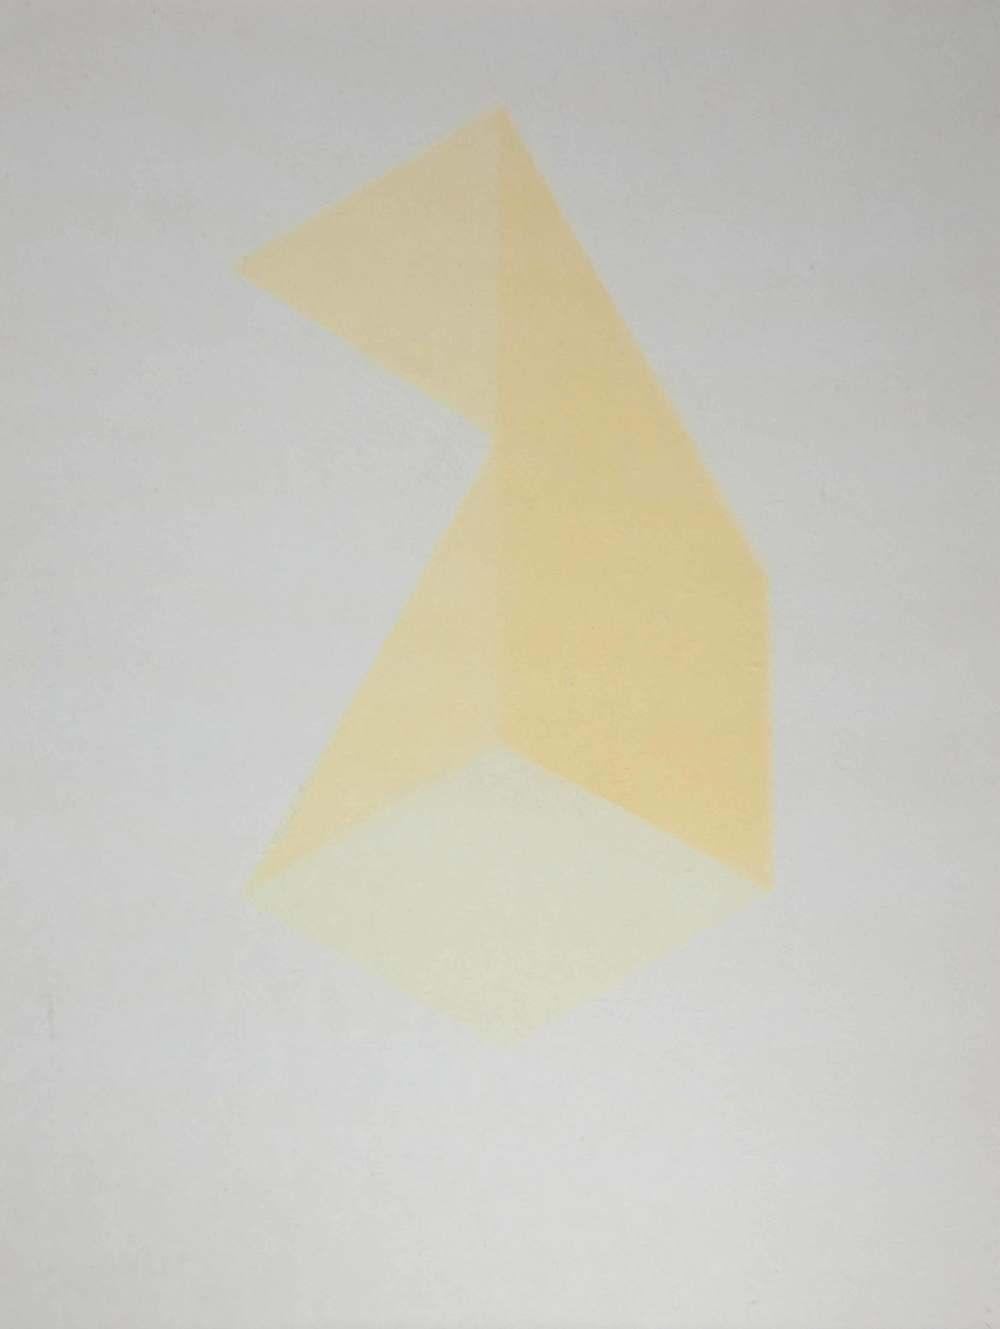 solar-stains-7.jpg